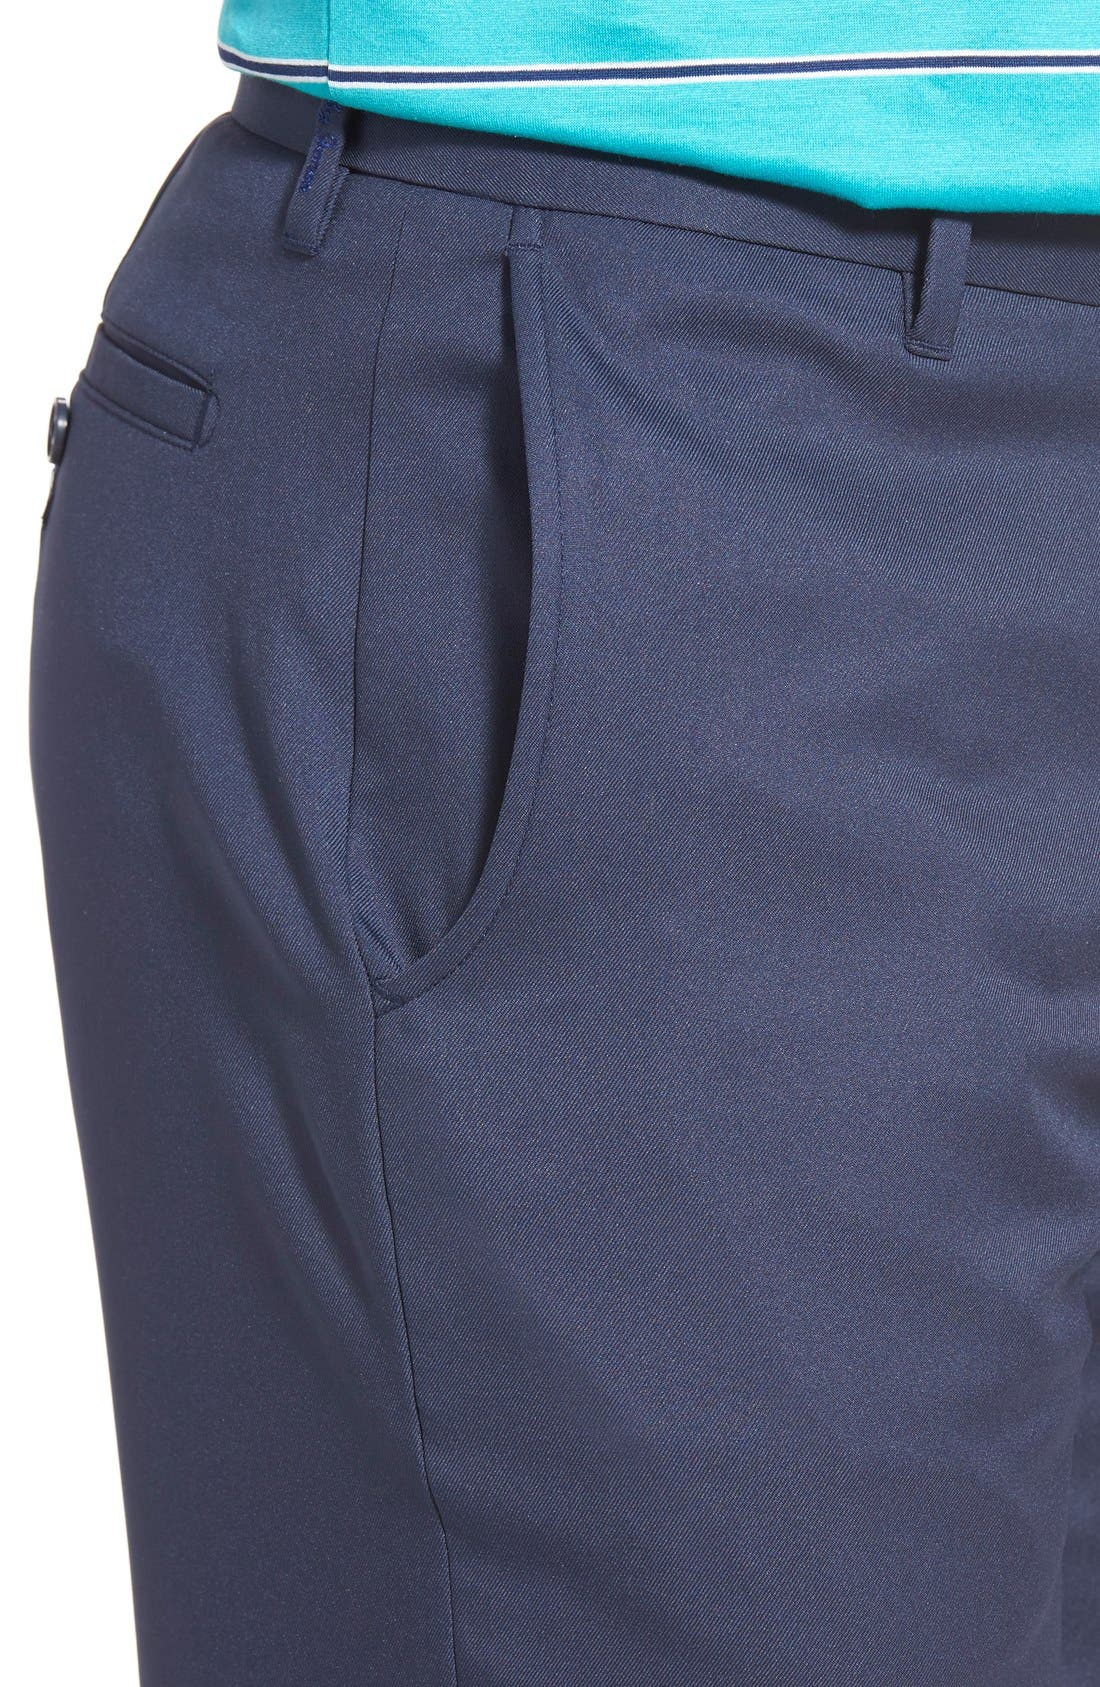 Alternate Image 4  - Bobby Jones 'Tech' Flat Front Wrinkle Free Golf Pants